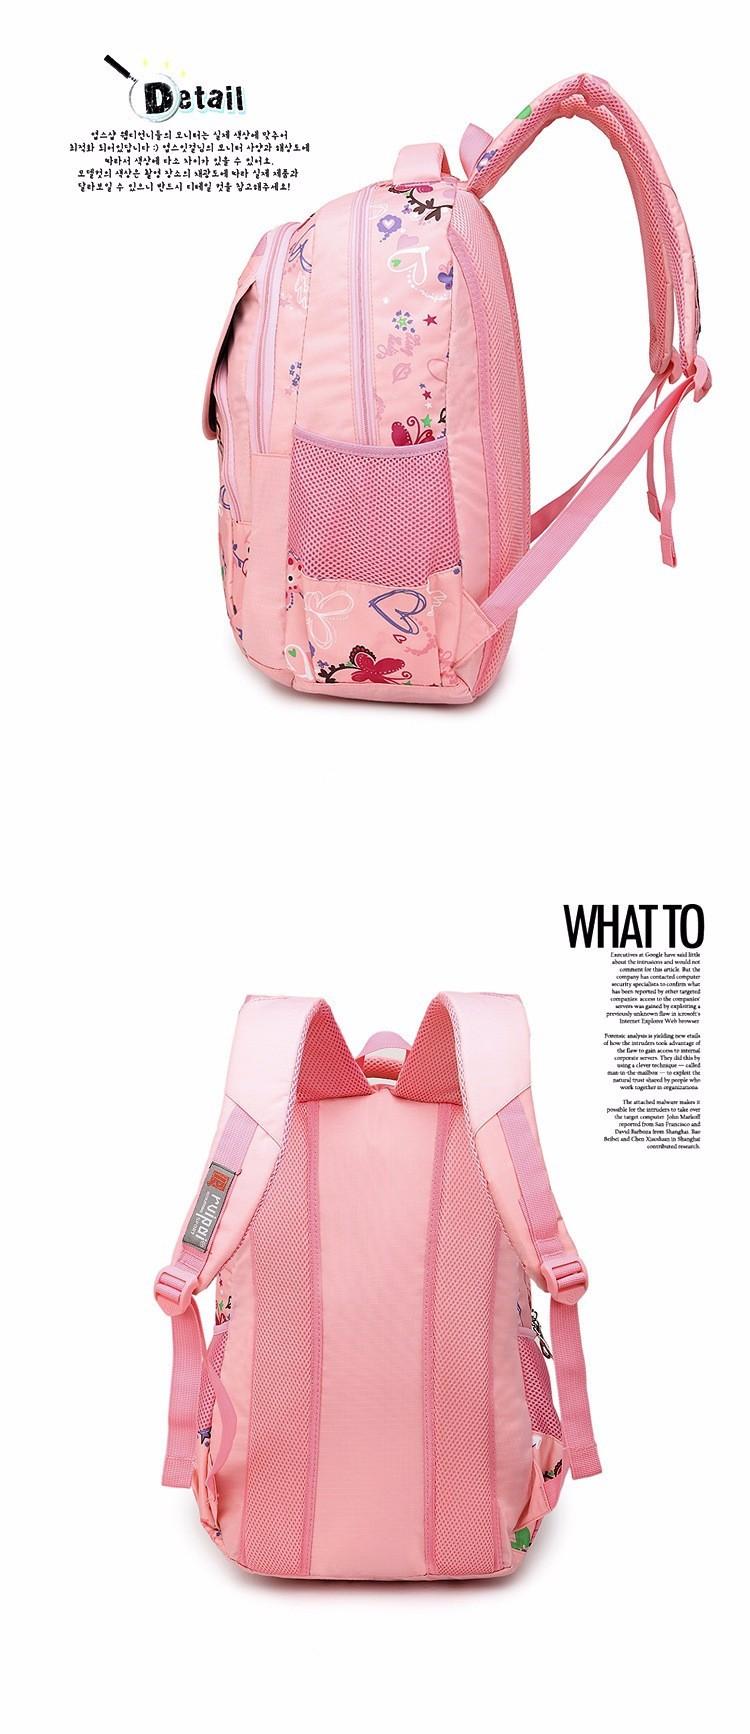 adc193f6c43c Дети детские школа книга сумка рюкзак, ортопедические ранец для ...